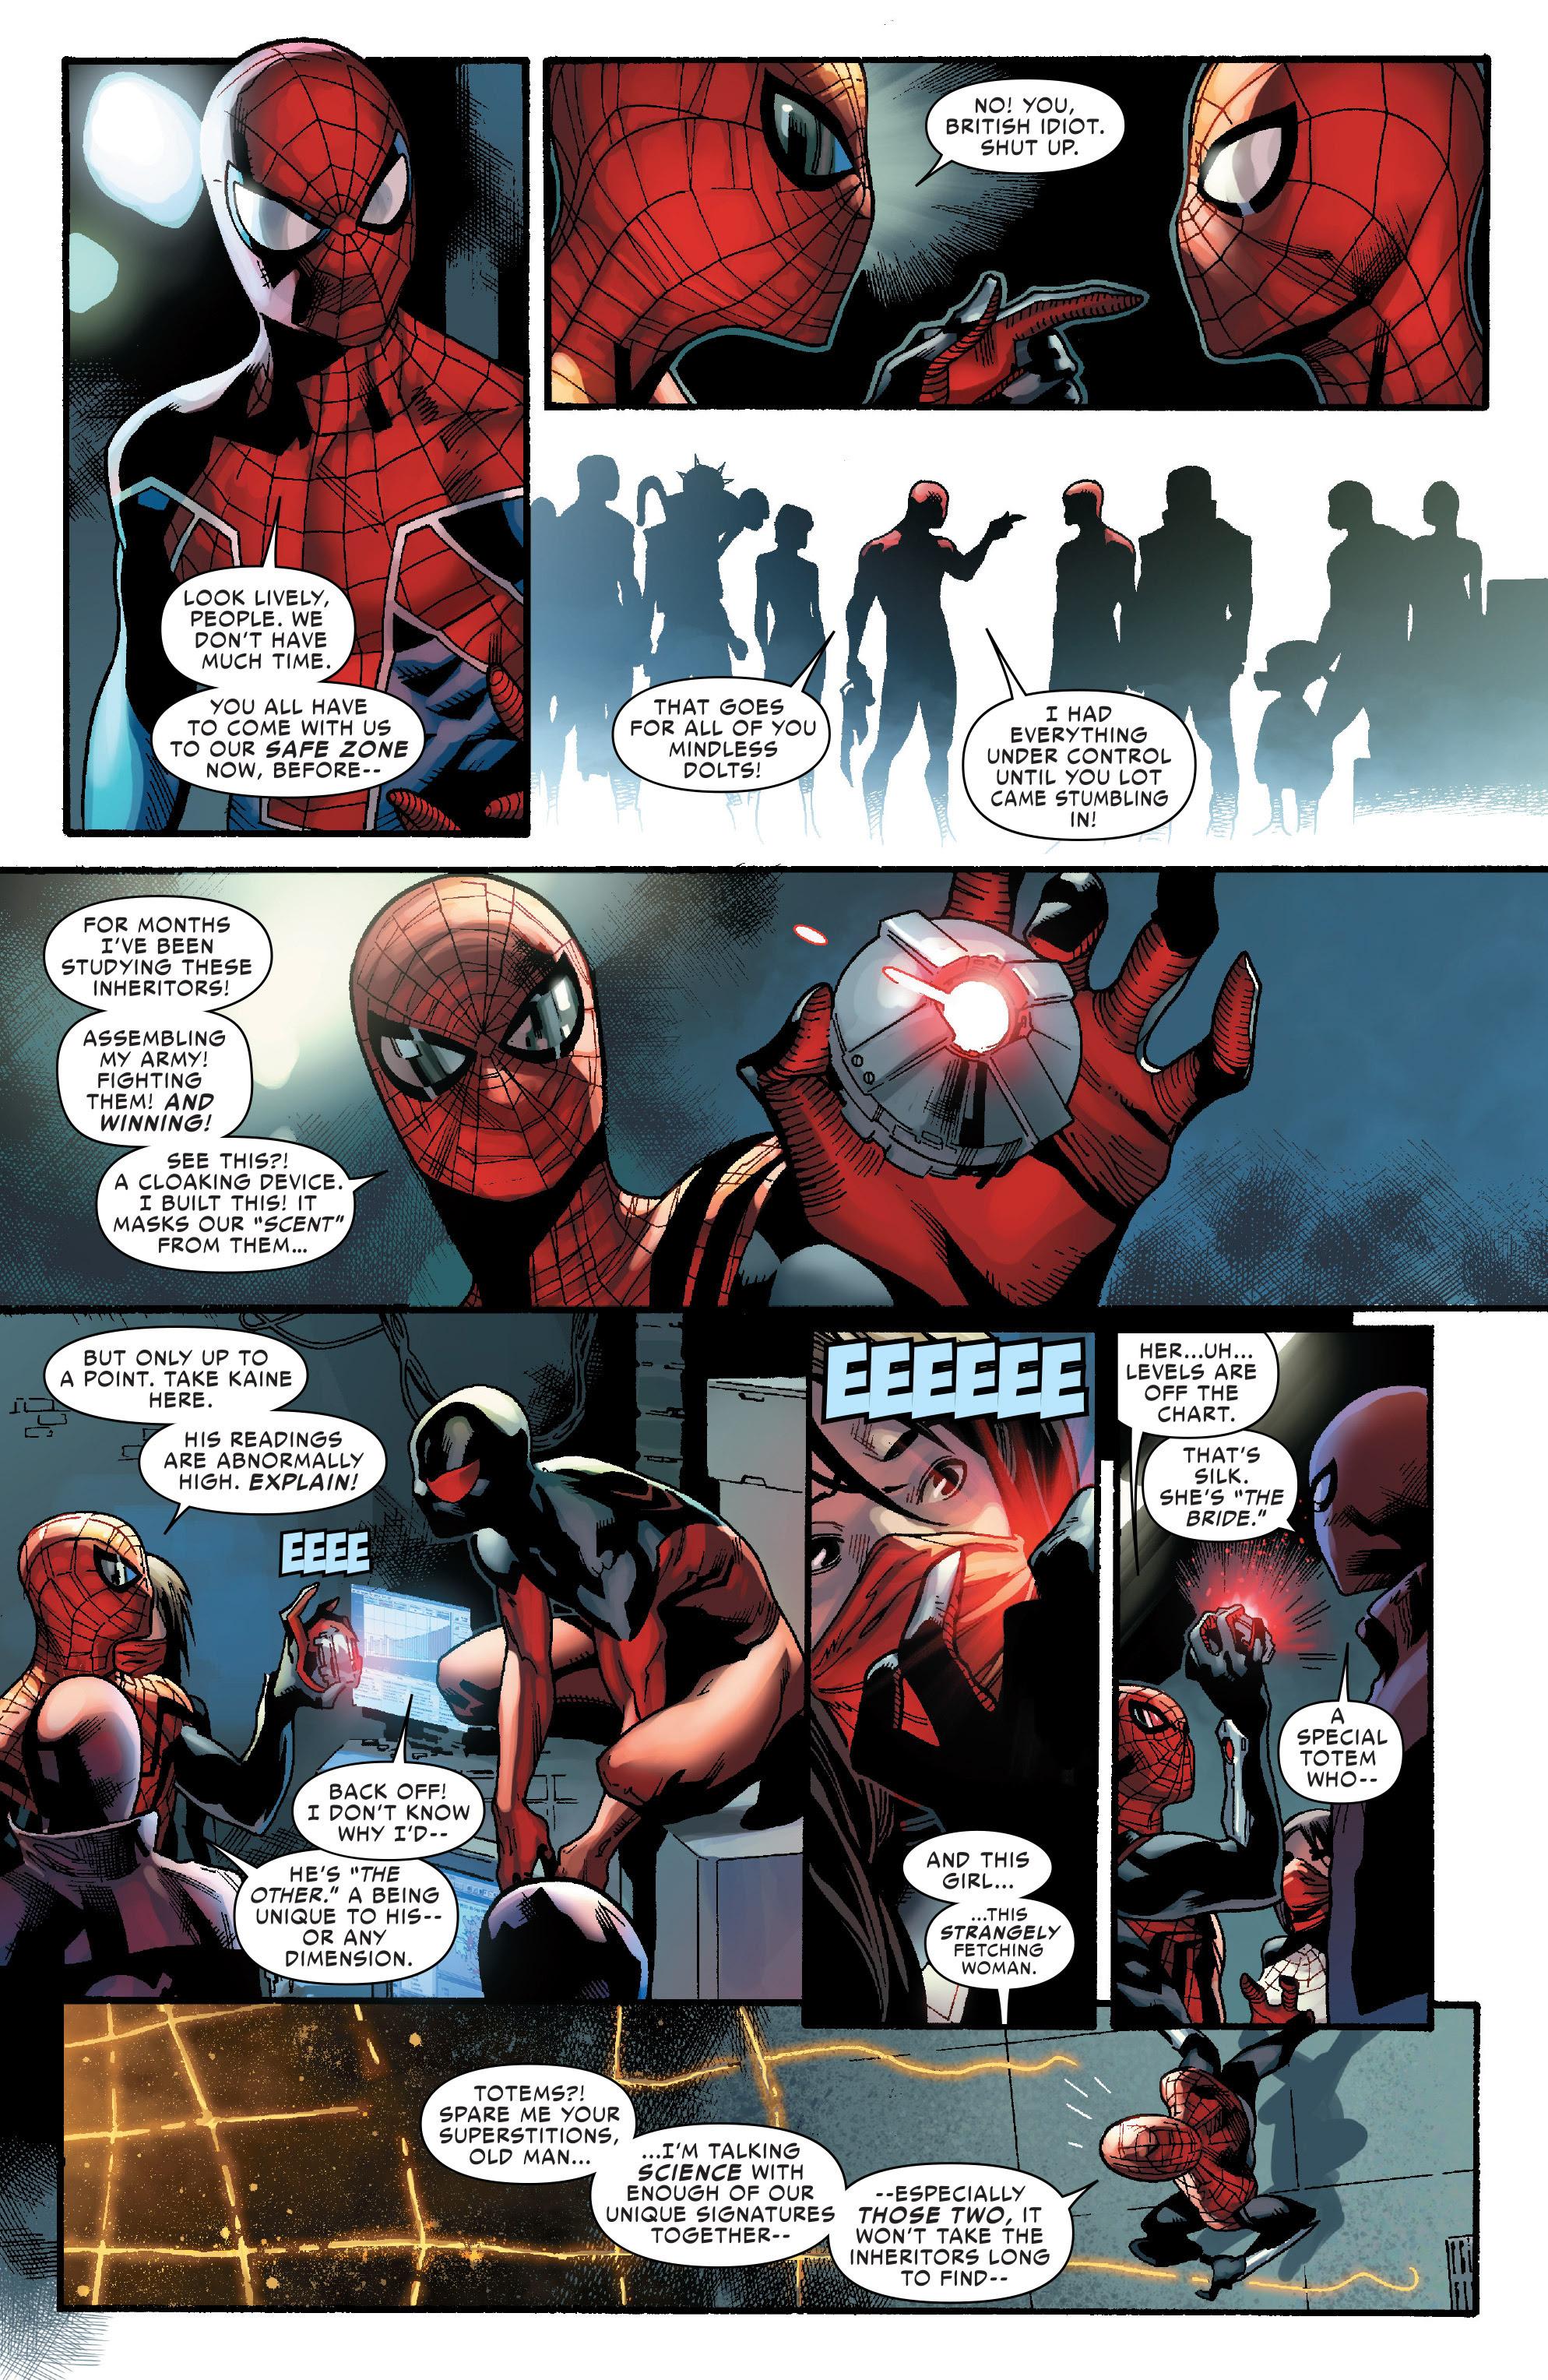 http://www.spidermancrawlspace.com/wp-content/uploads/2014/11/AmazingSpider-Man201410-p9.jpg